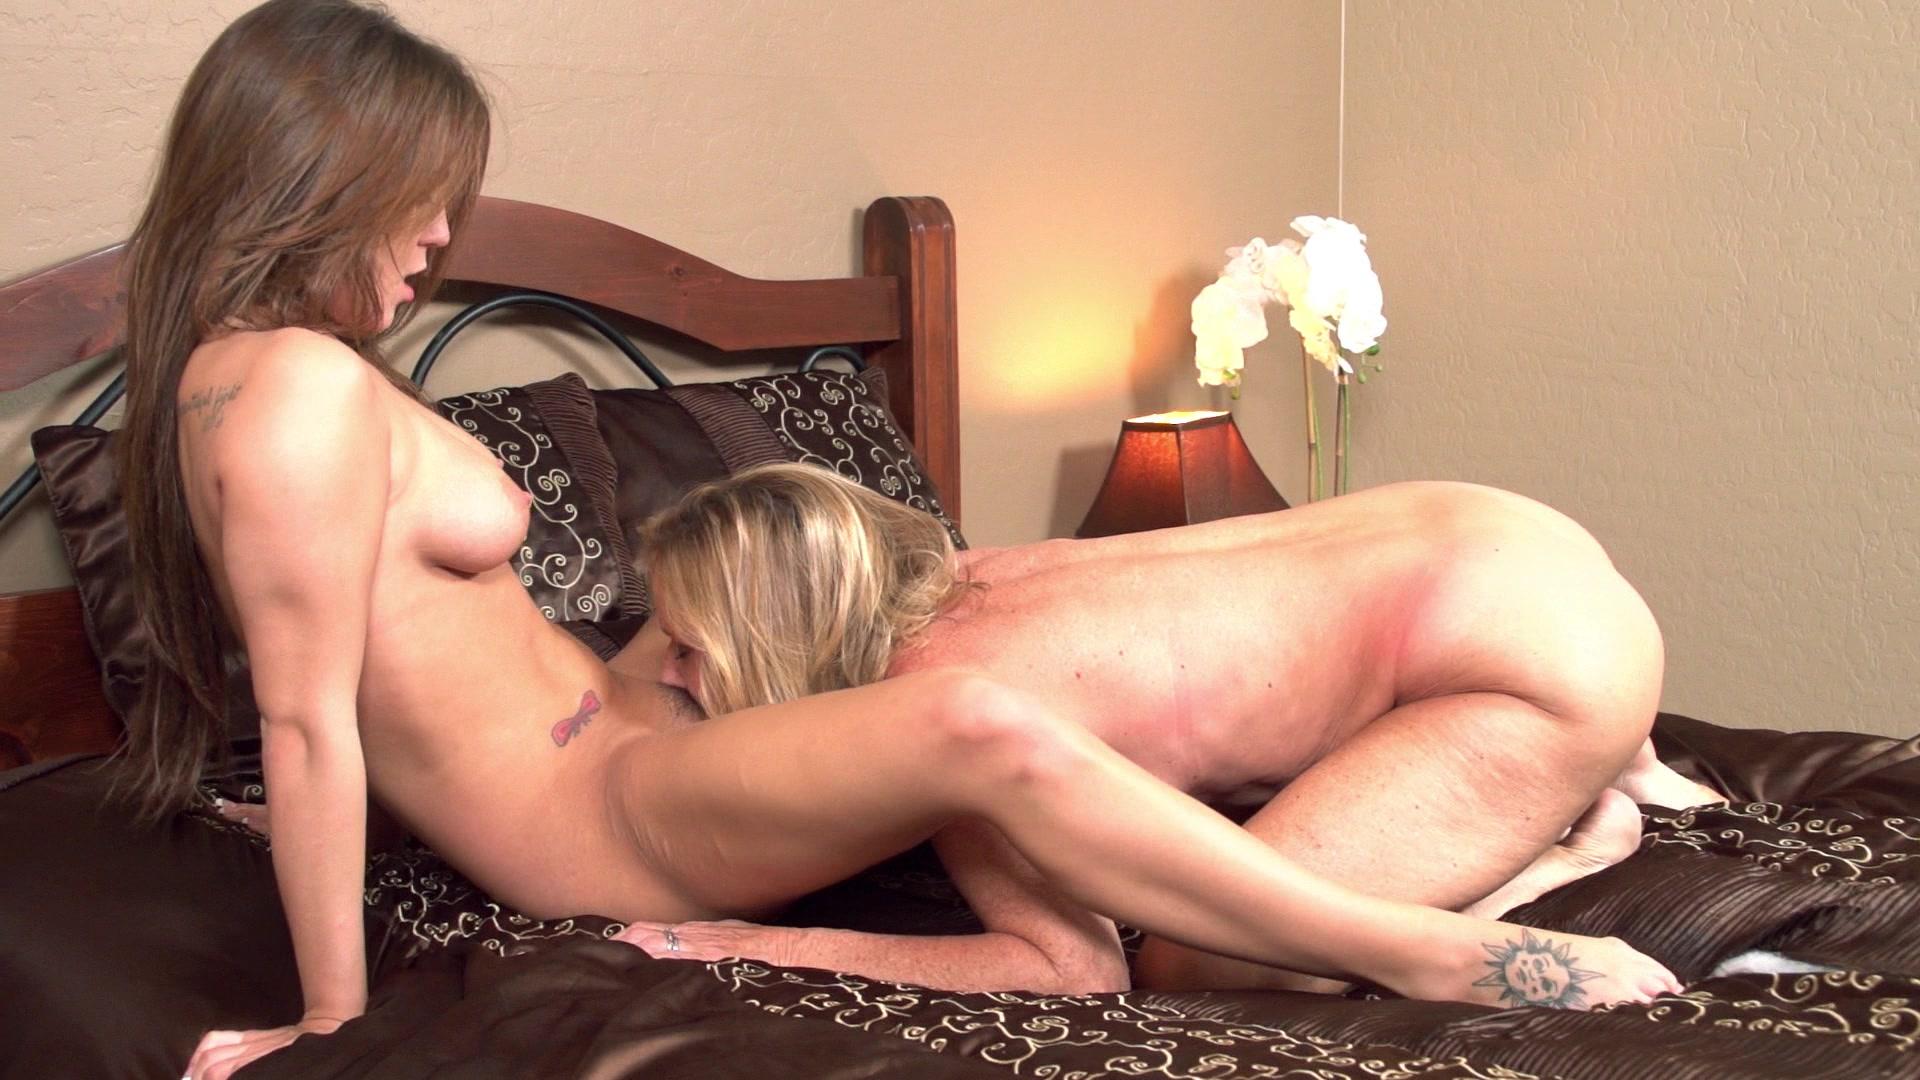 www lesbian training com: